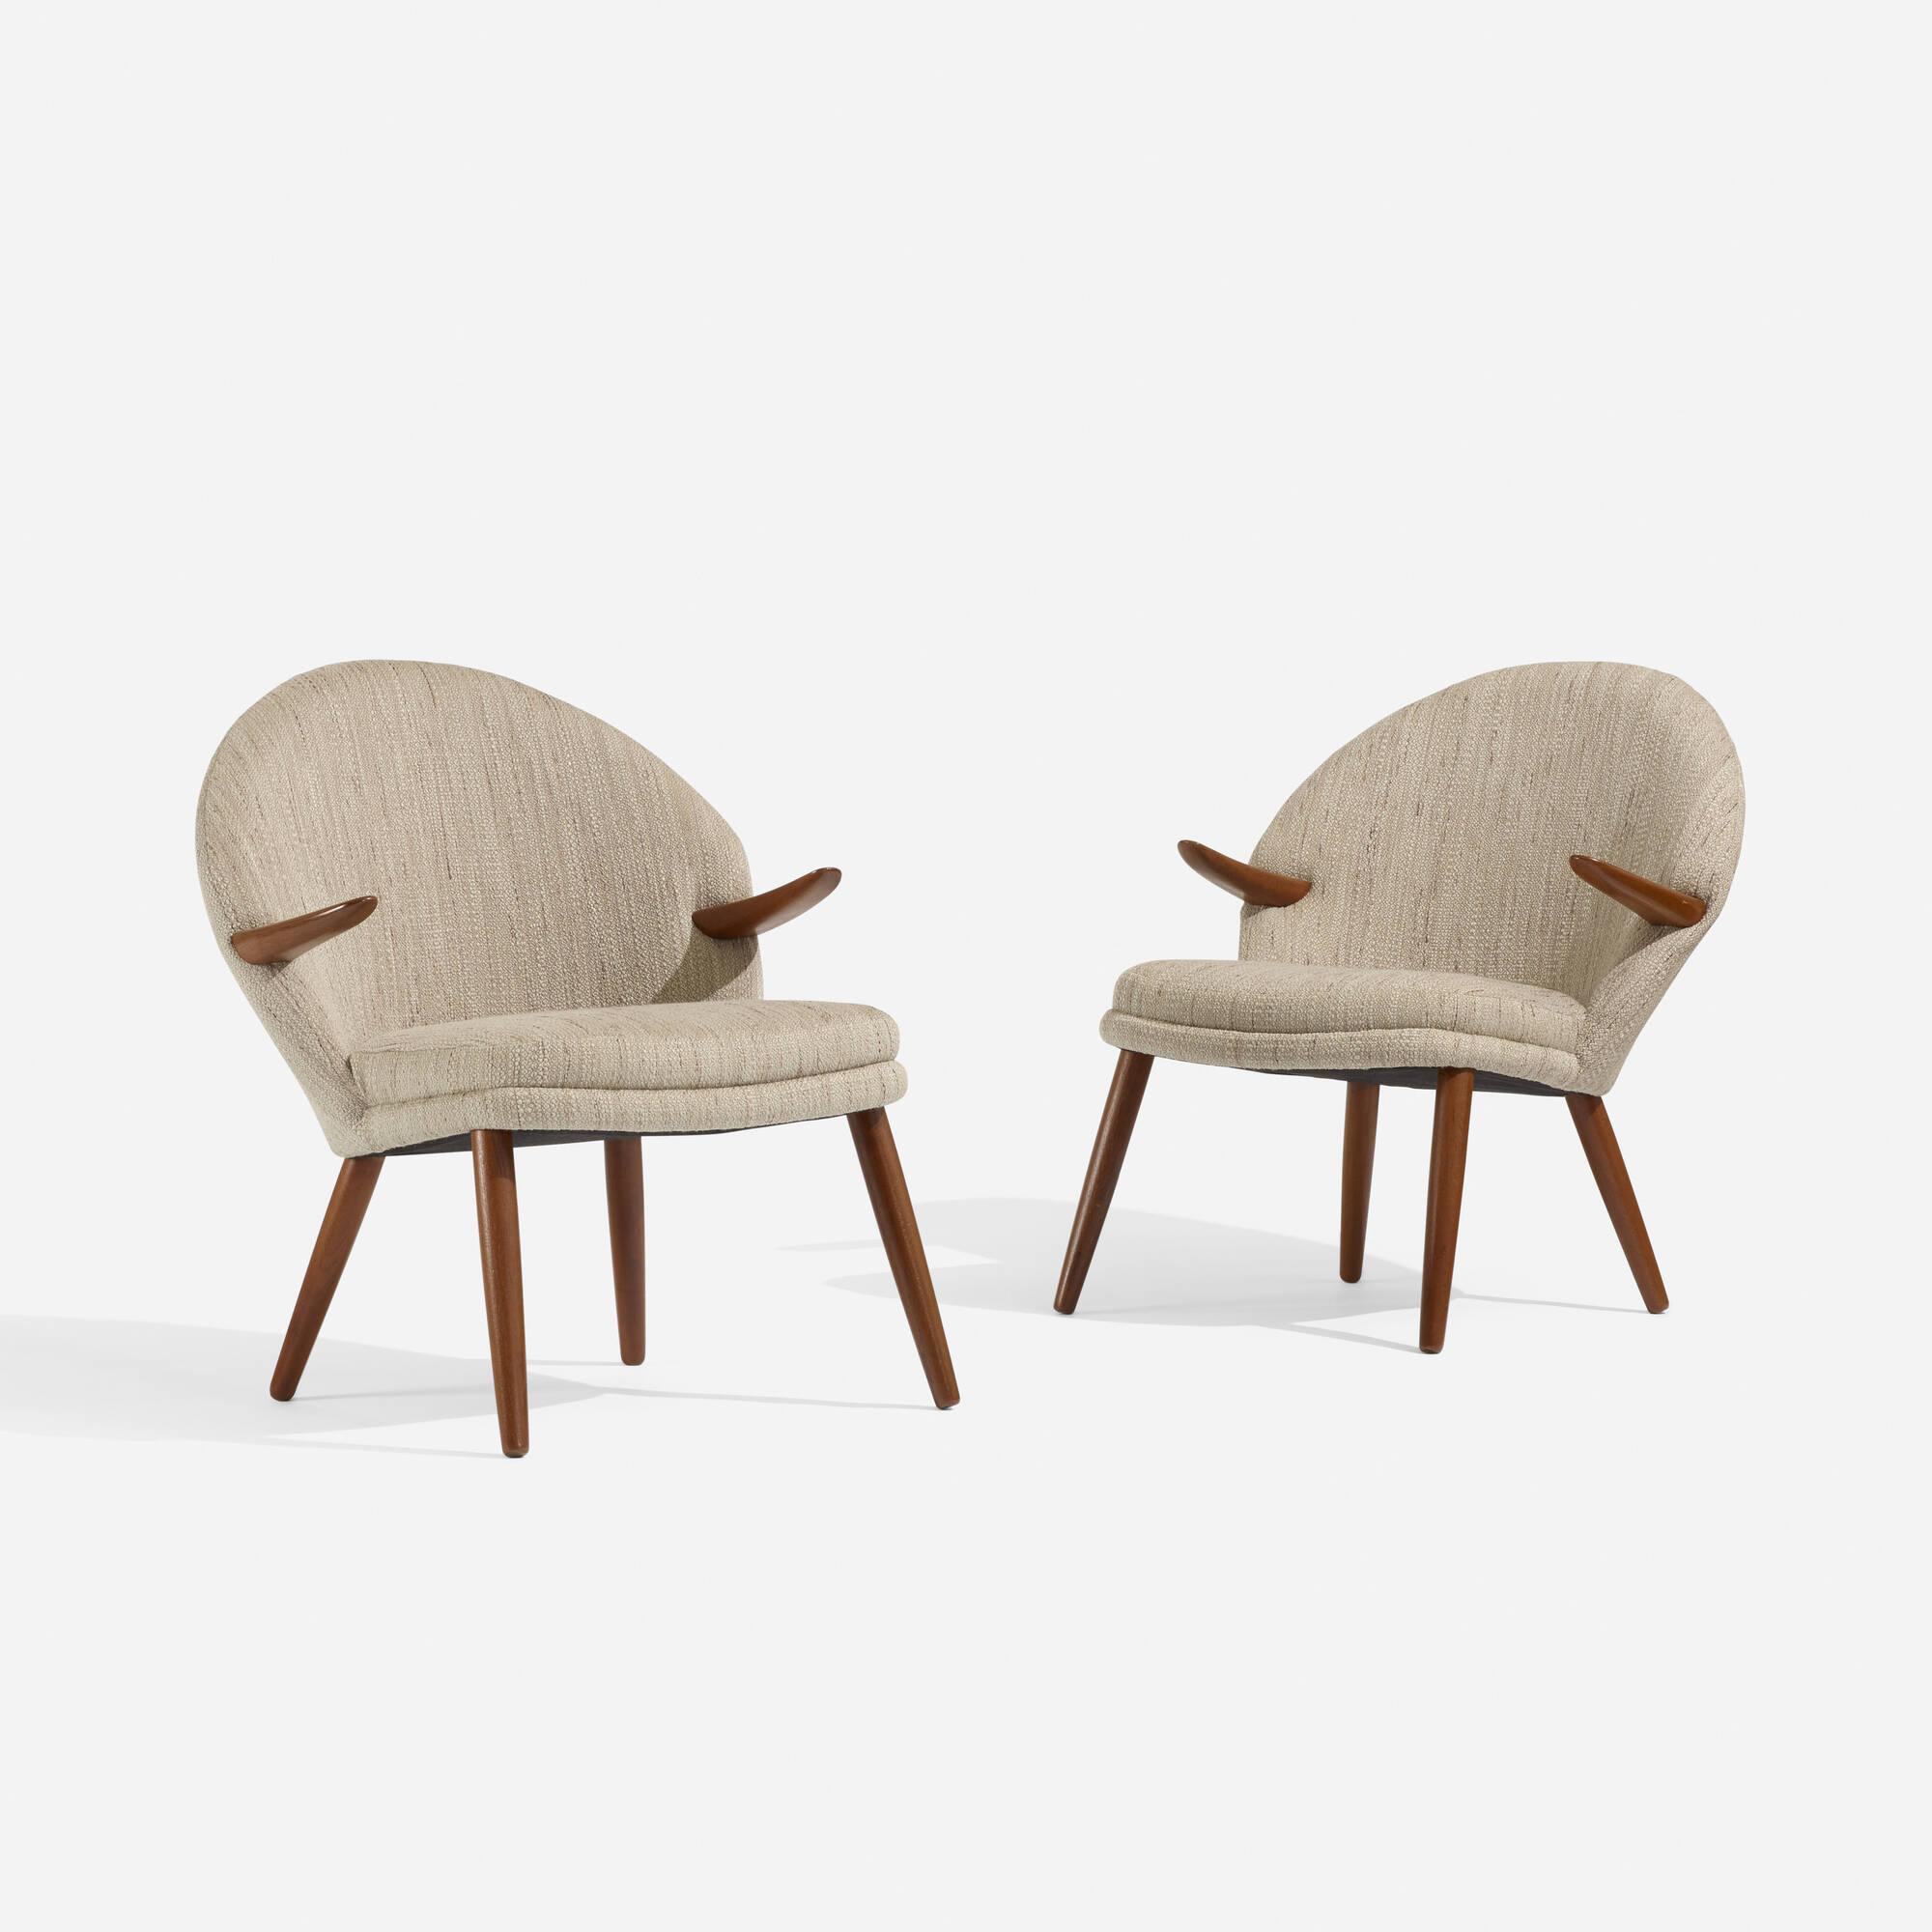 140: Kurt Olsen / lounge chairs, pair (1 of 3)